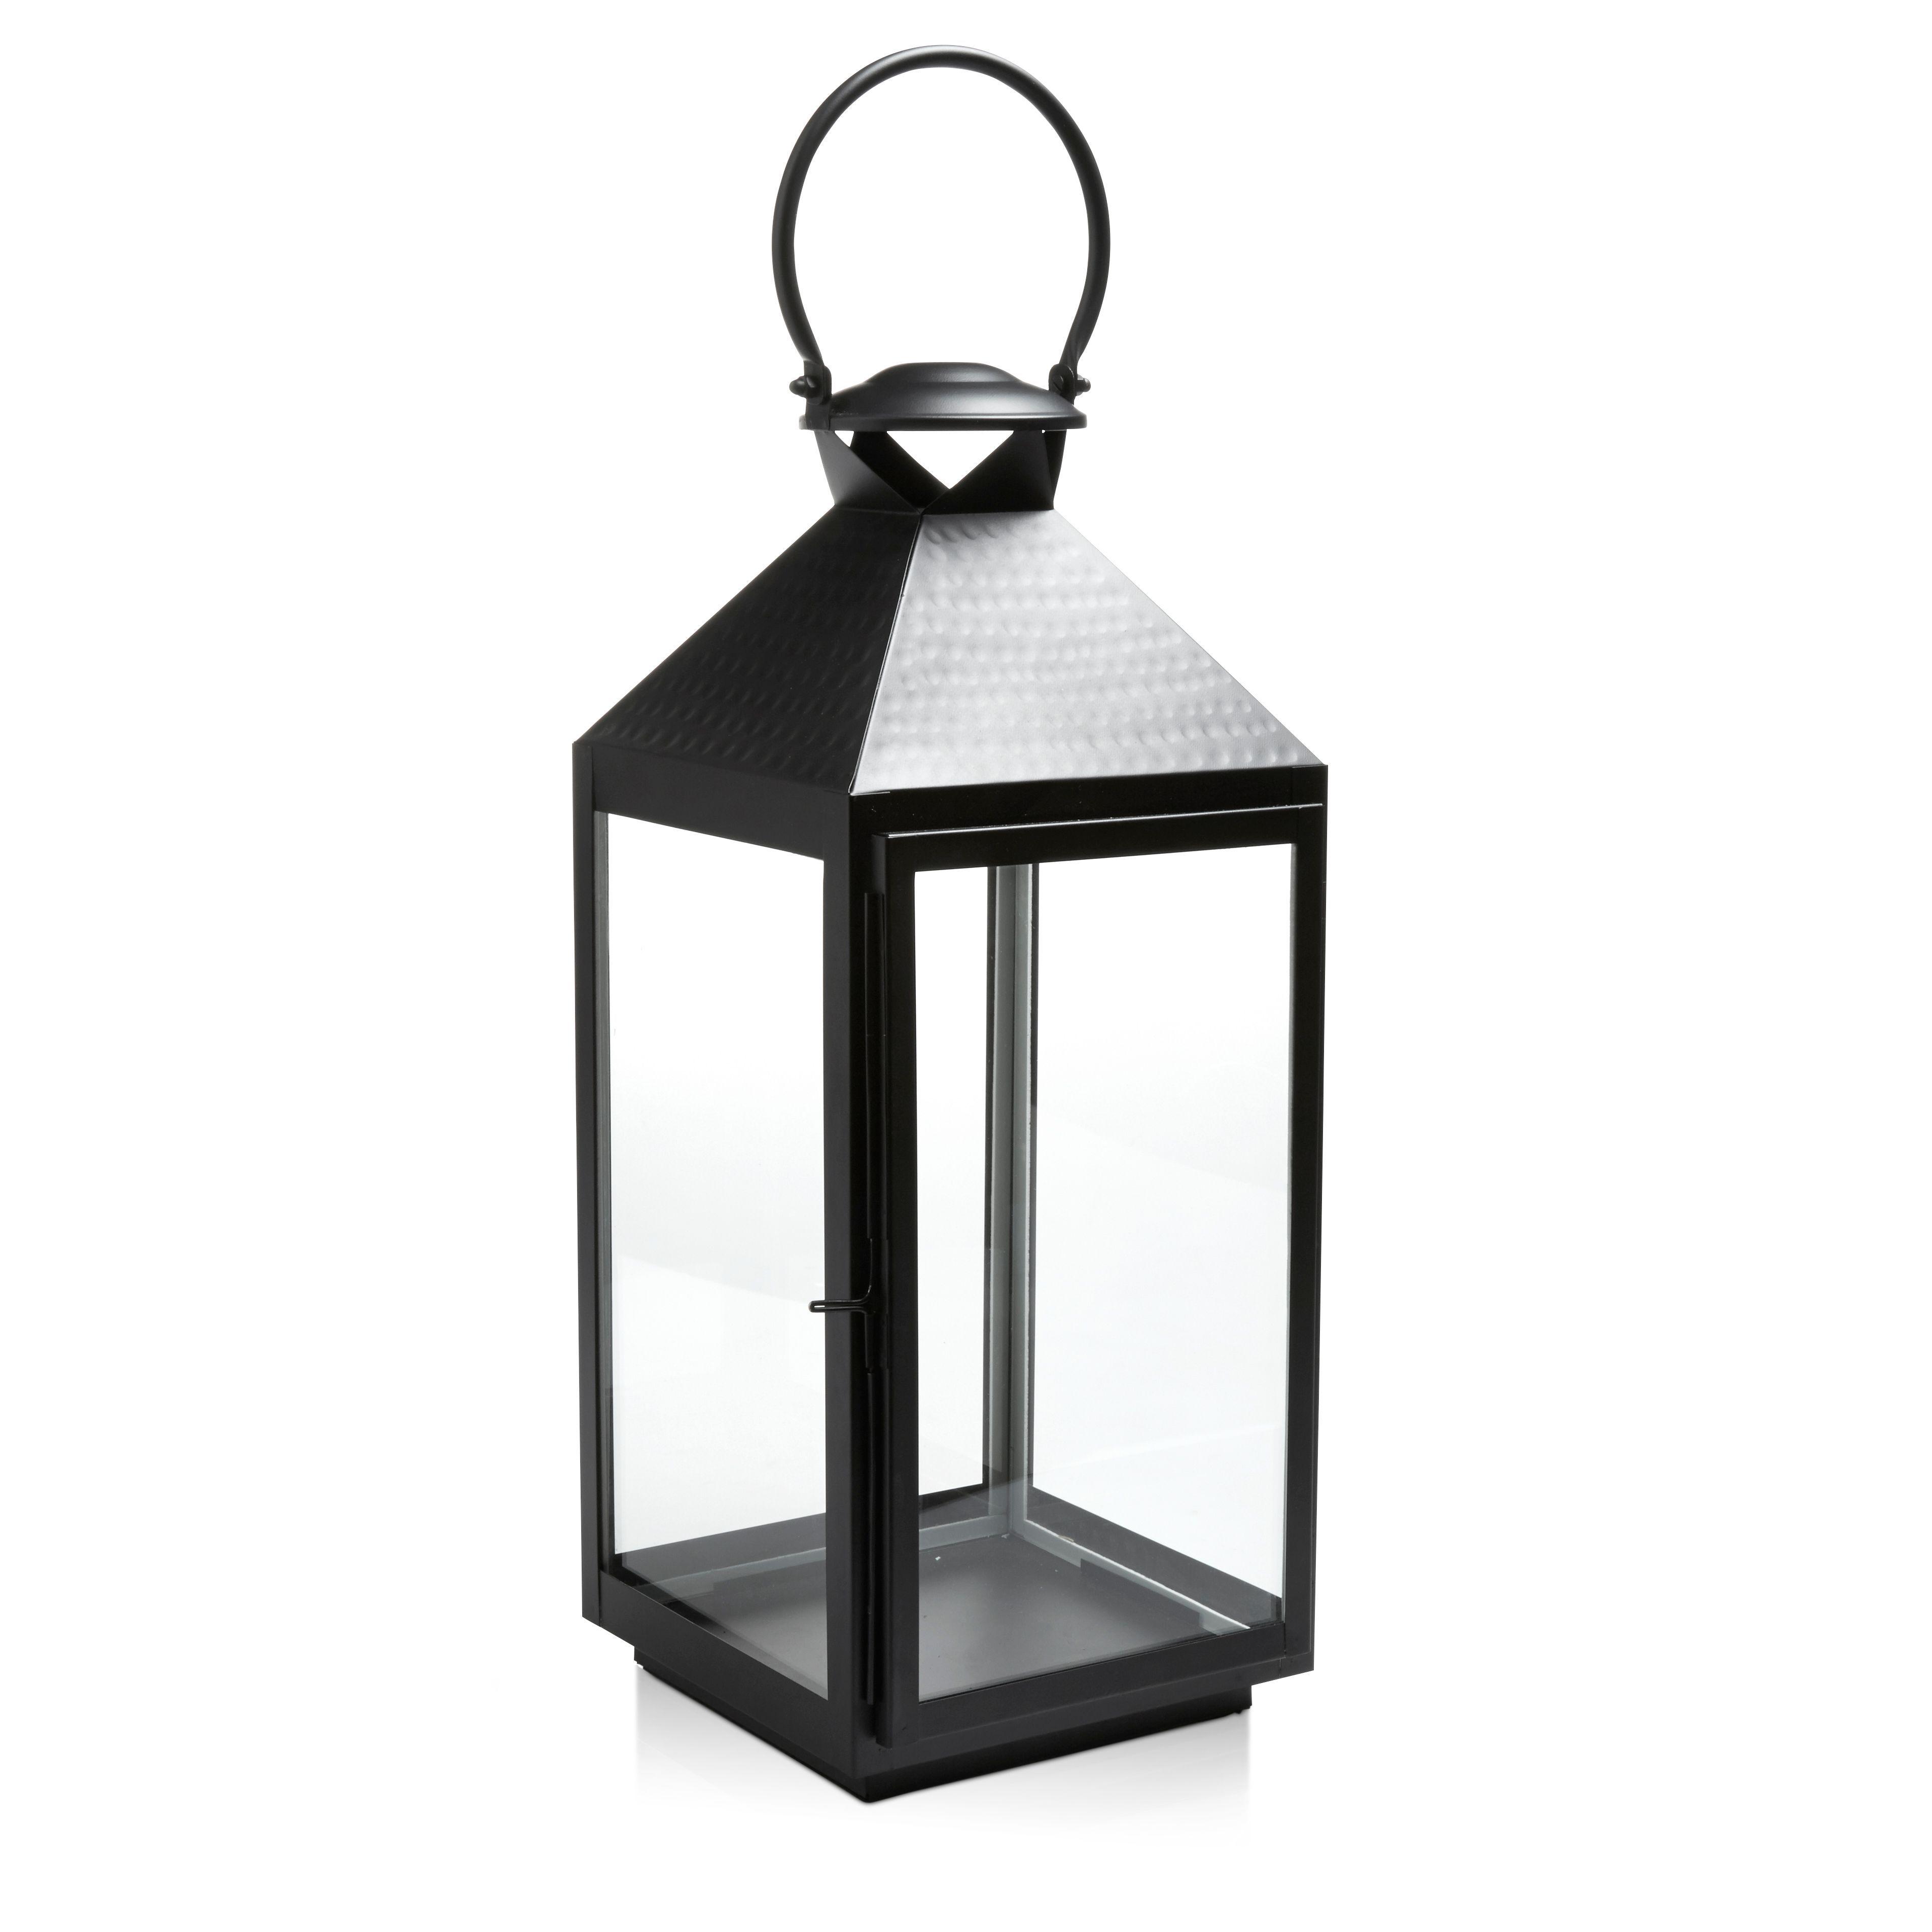 Solar Lights B Q: Black Iron & Glass Hurricane Lantern, Large